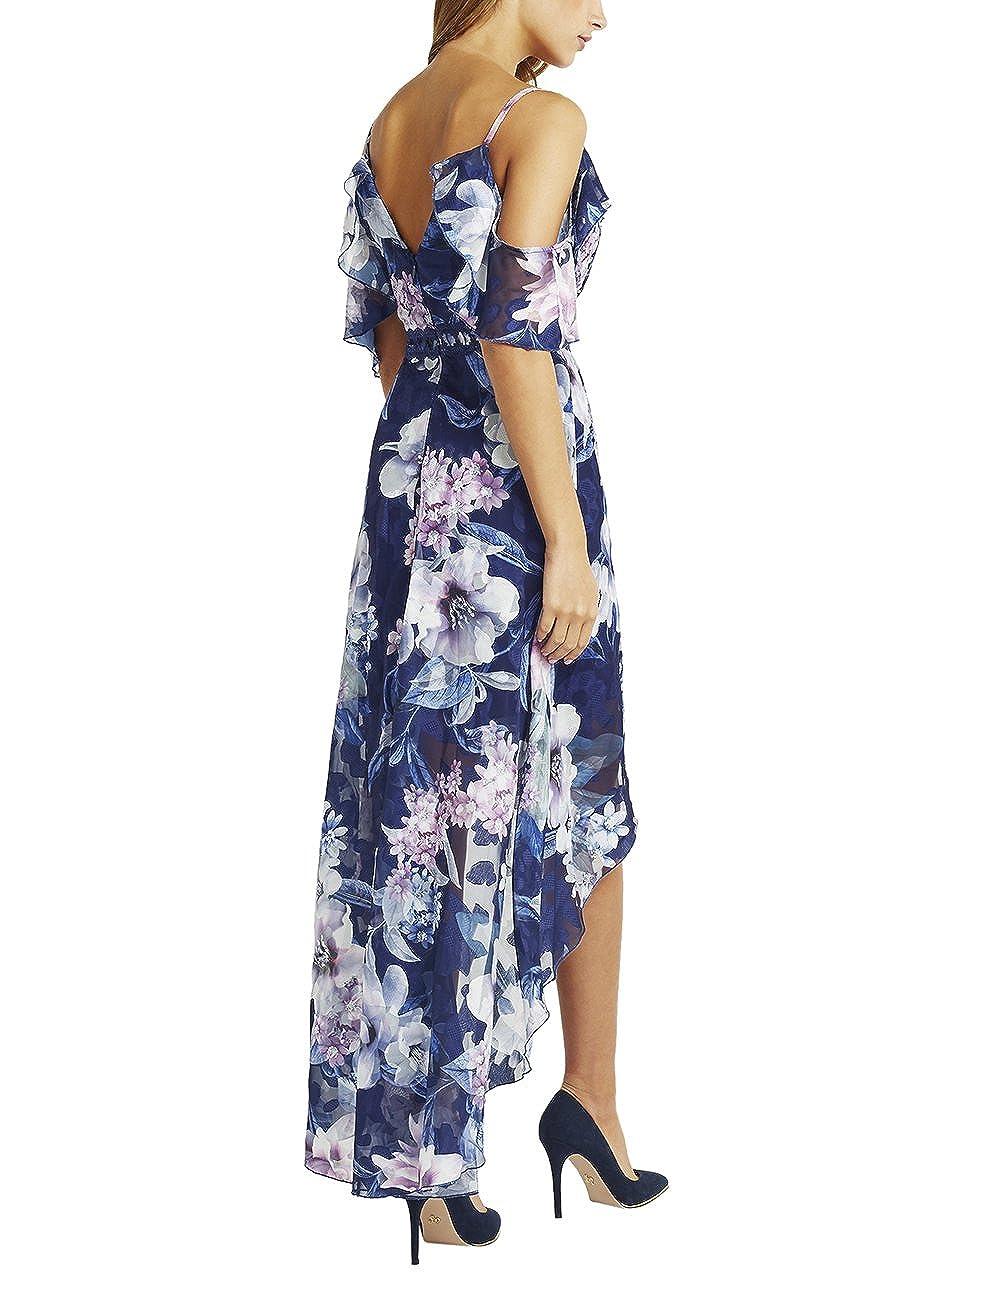 496be6e3daf25b Lipsy Floral Print Burnout Maxi Dress Uk – DACC